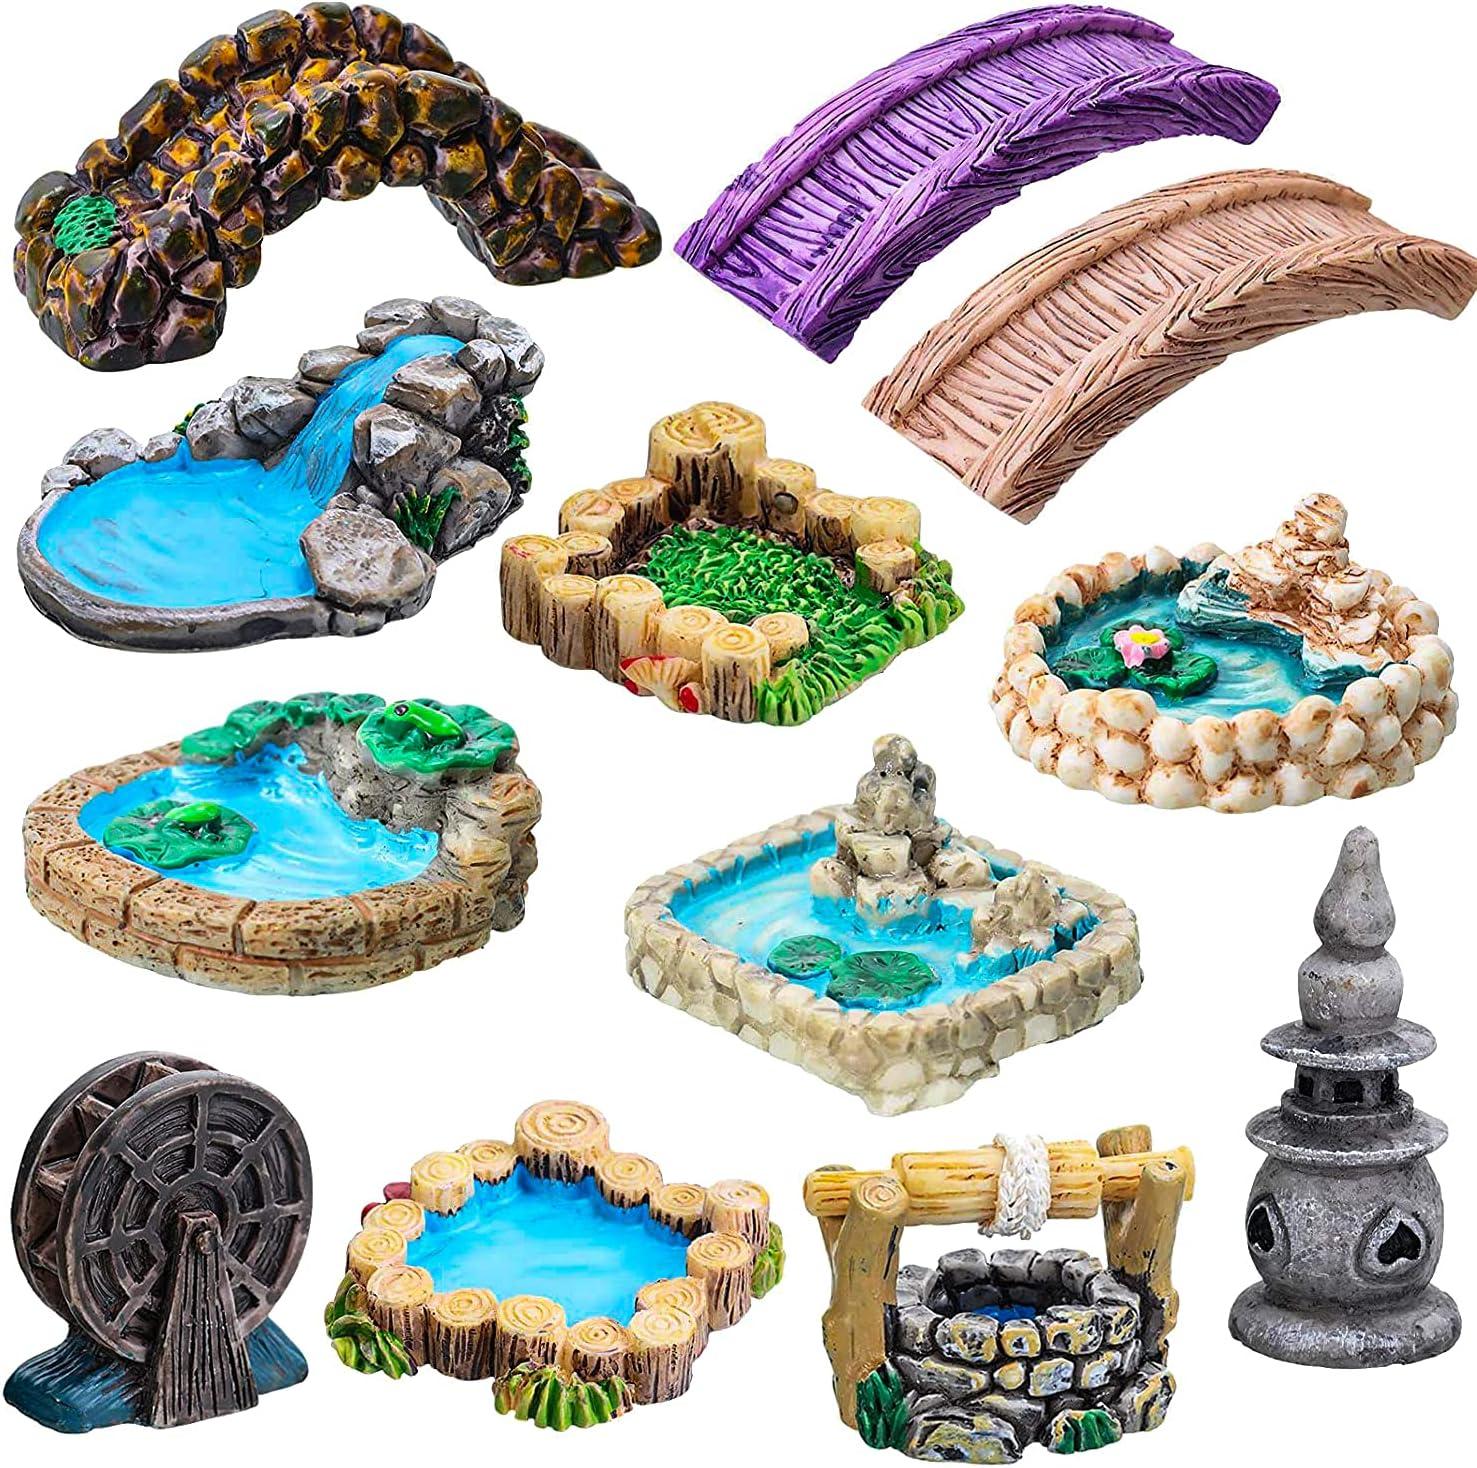 12 PCS Miniature Fairy Garden Accessories,Miniature Pond Lawn Garden Ornament Figurines, Mini Lighthouse Water Well Bridge Figurines, Micro Landscape Ornaments for Garden DIY Kit